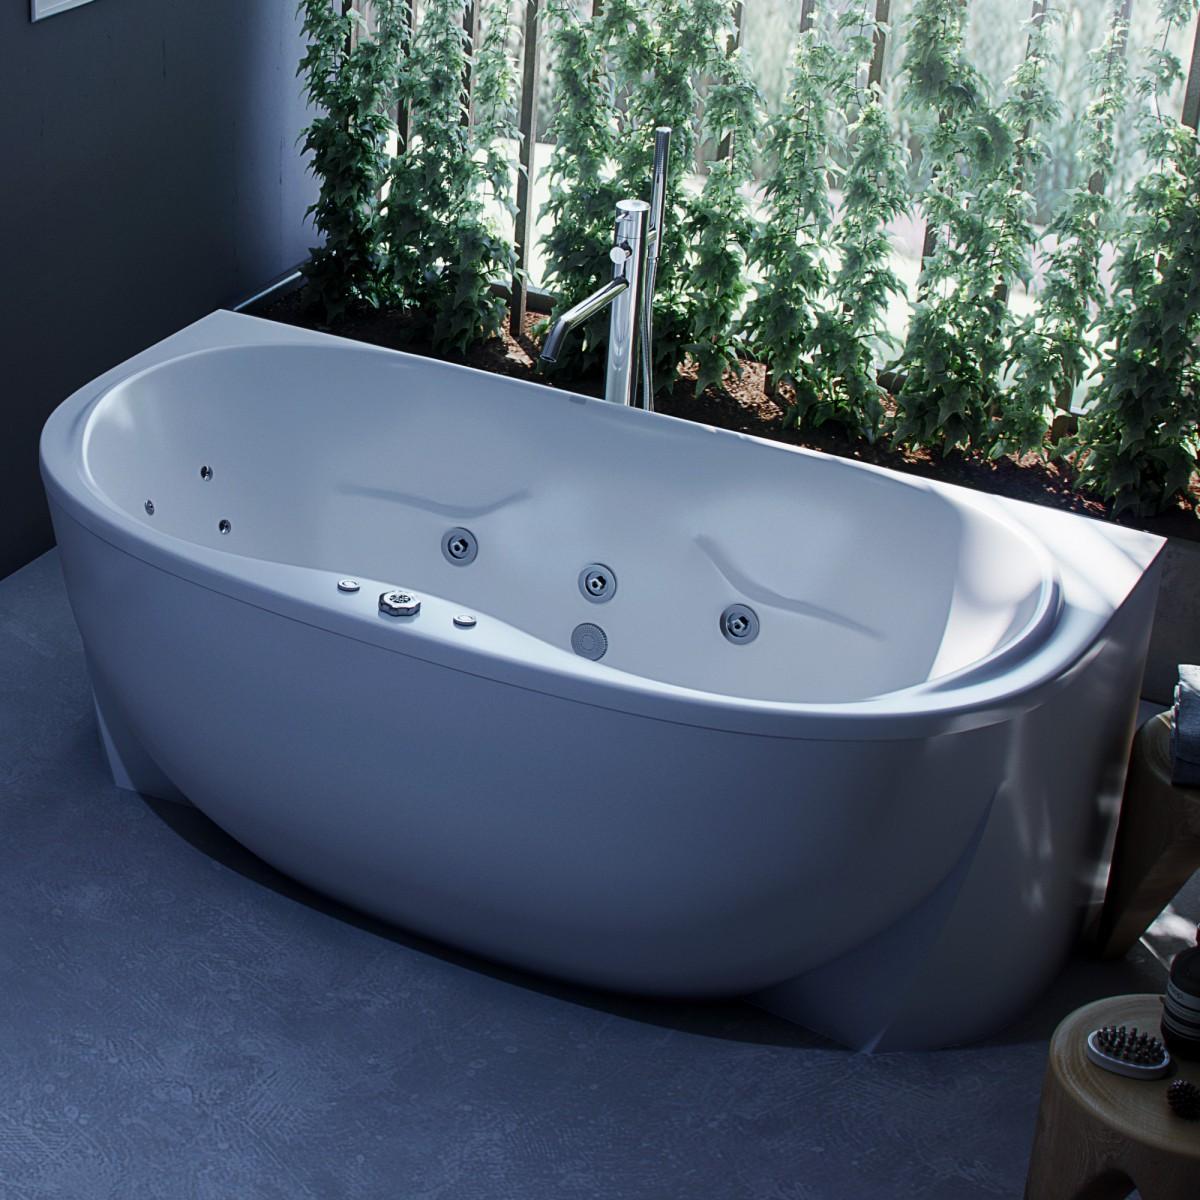 Акриловая ванна Акватек Мелисса 180х95 на каркасе со сливом-переливом